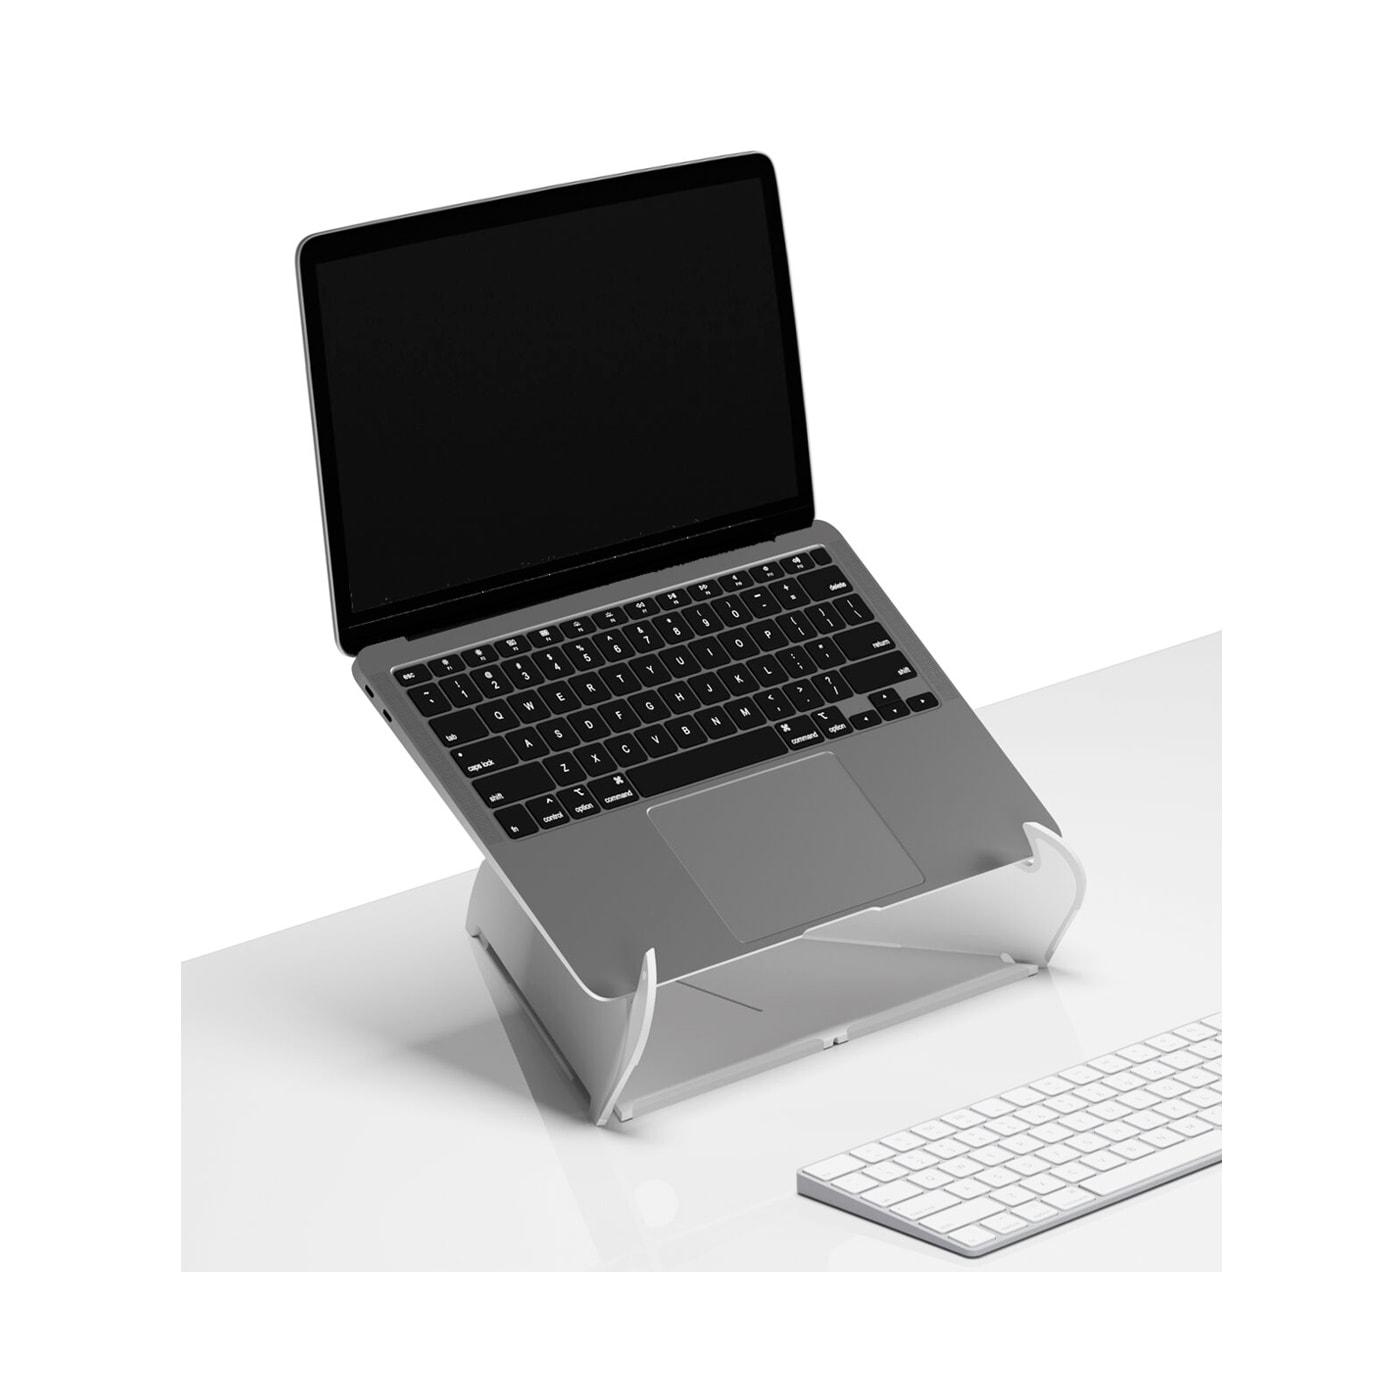 Herman Miller Oripura porta laptop portatile vendita online